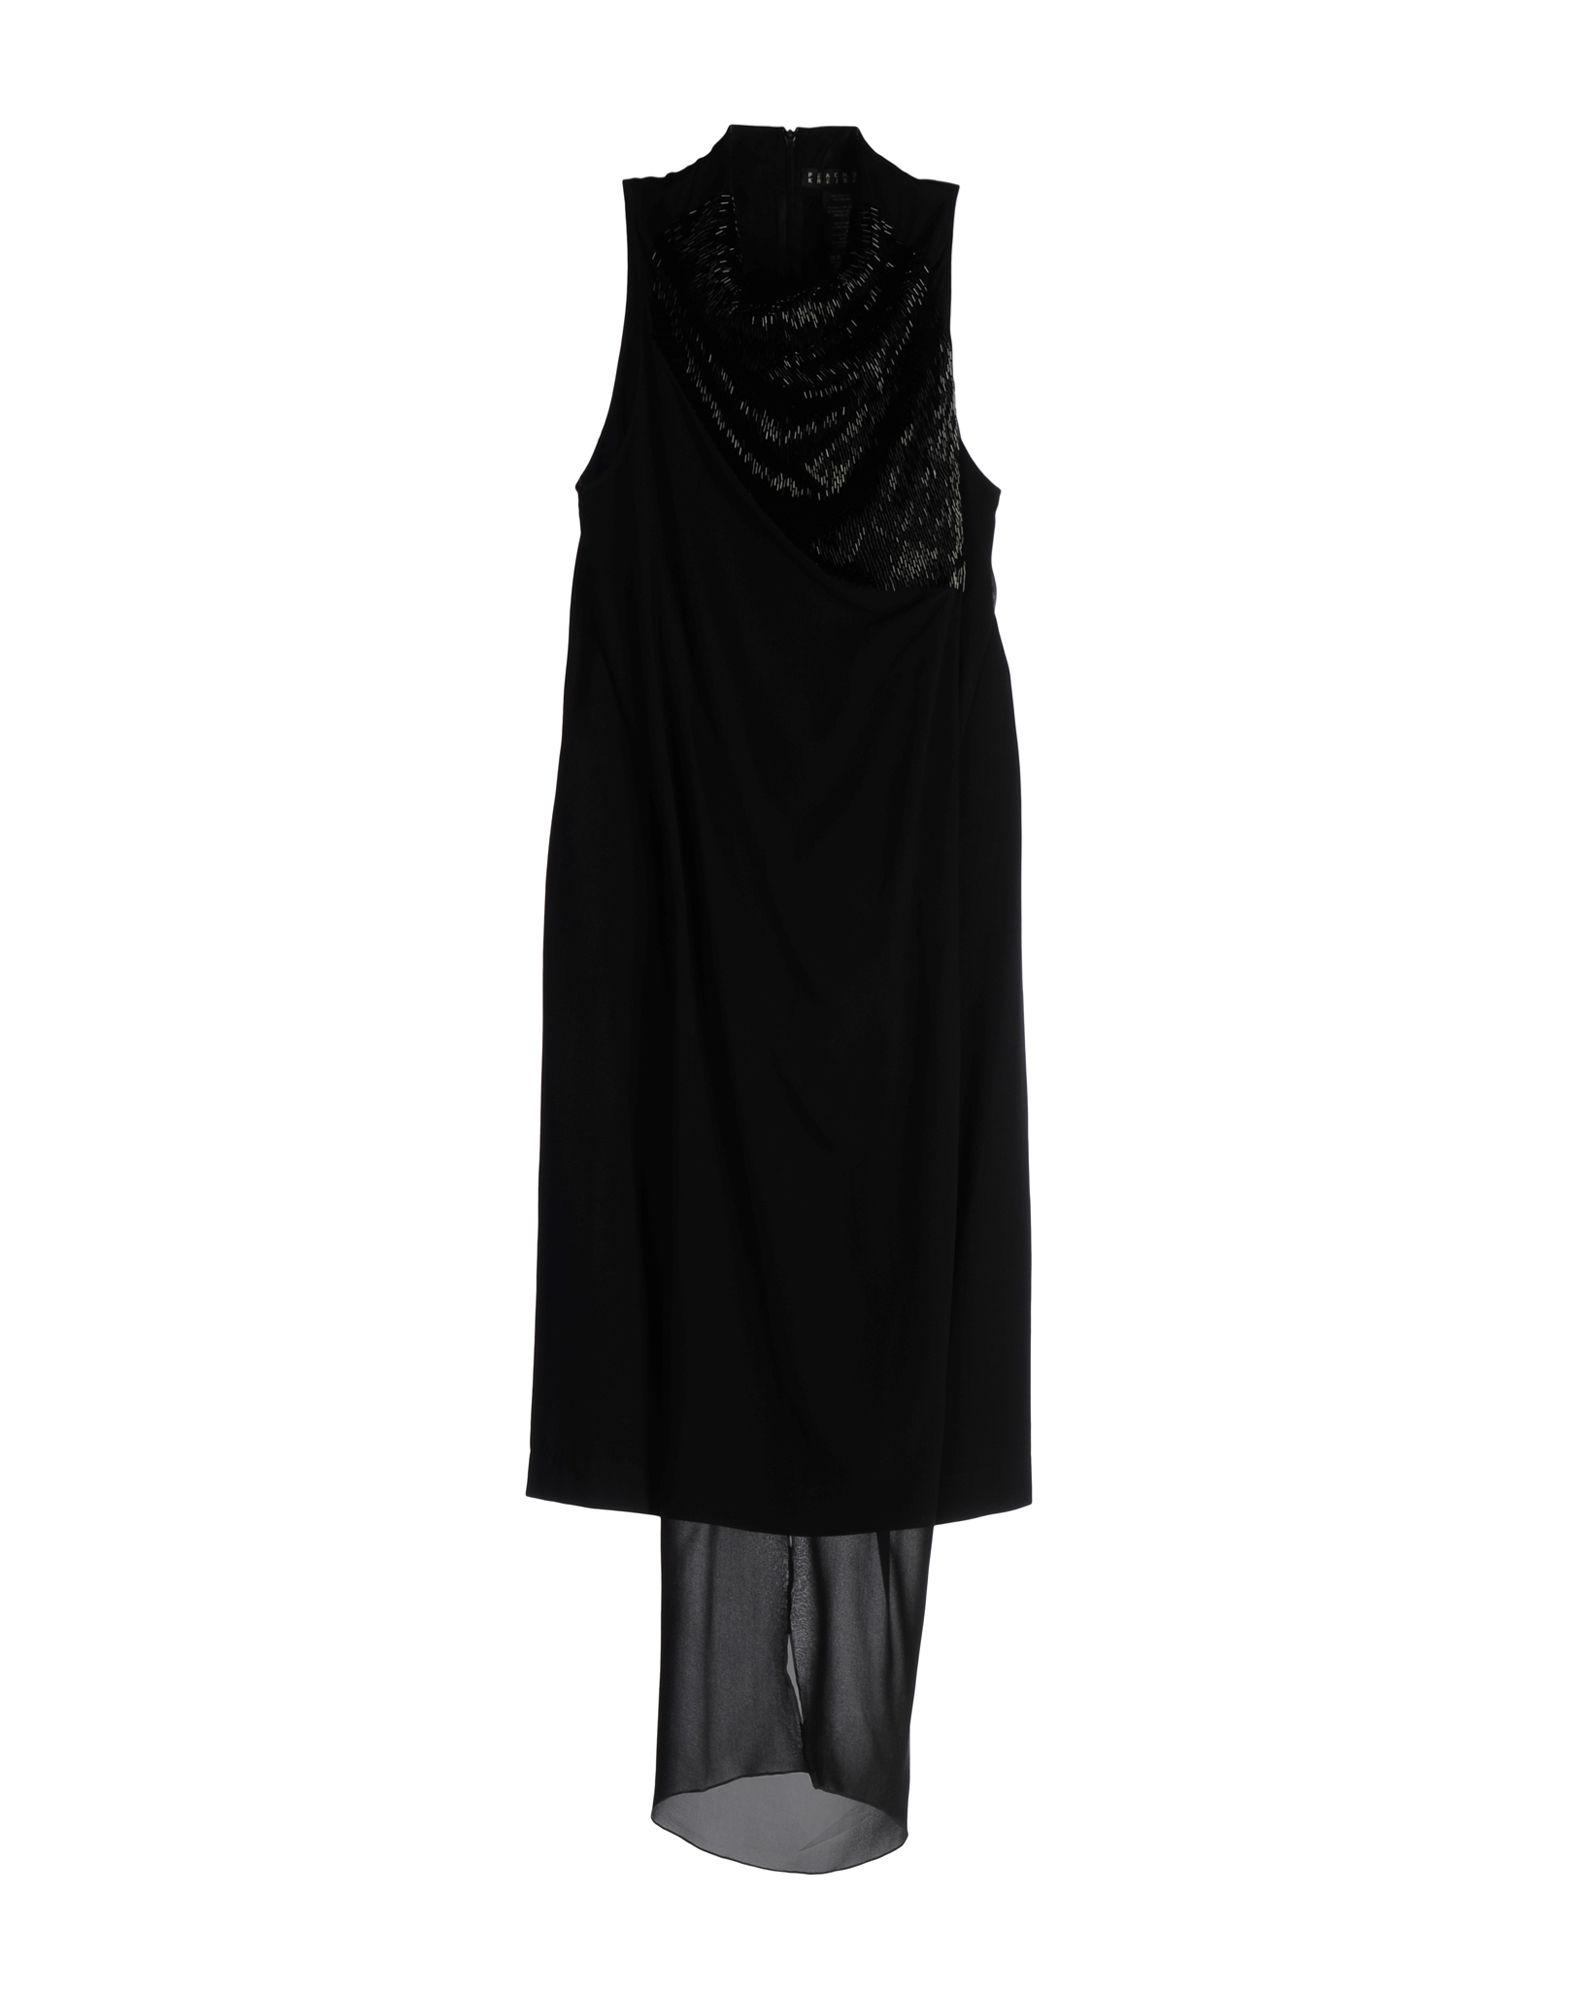 peachoo krejberg короткое платье PEACHOO+KREJBERG Платье до колена